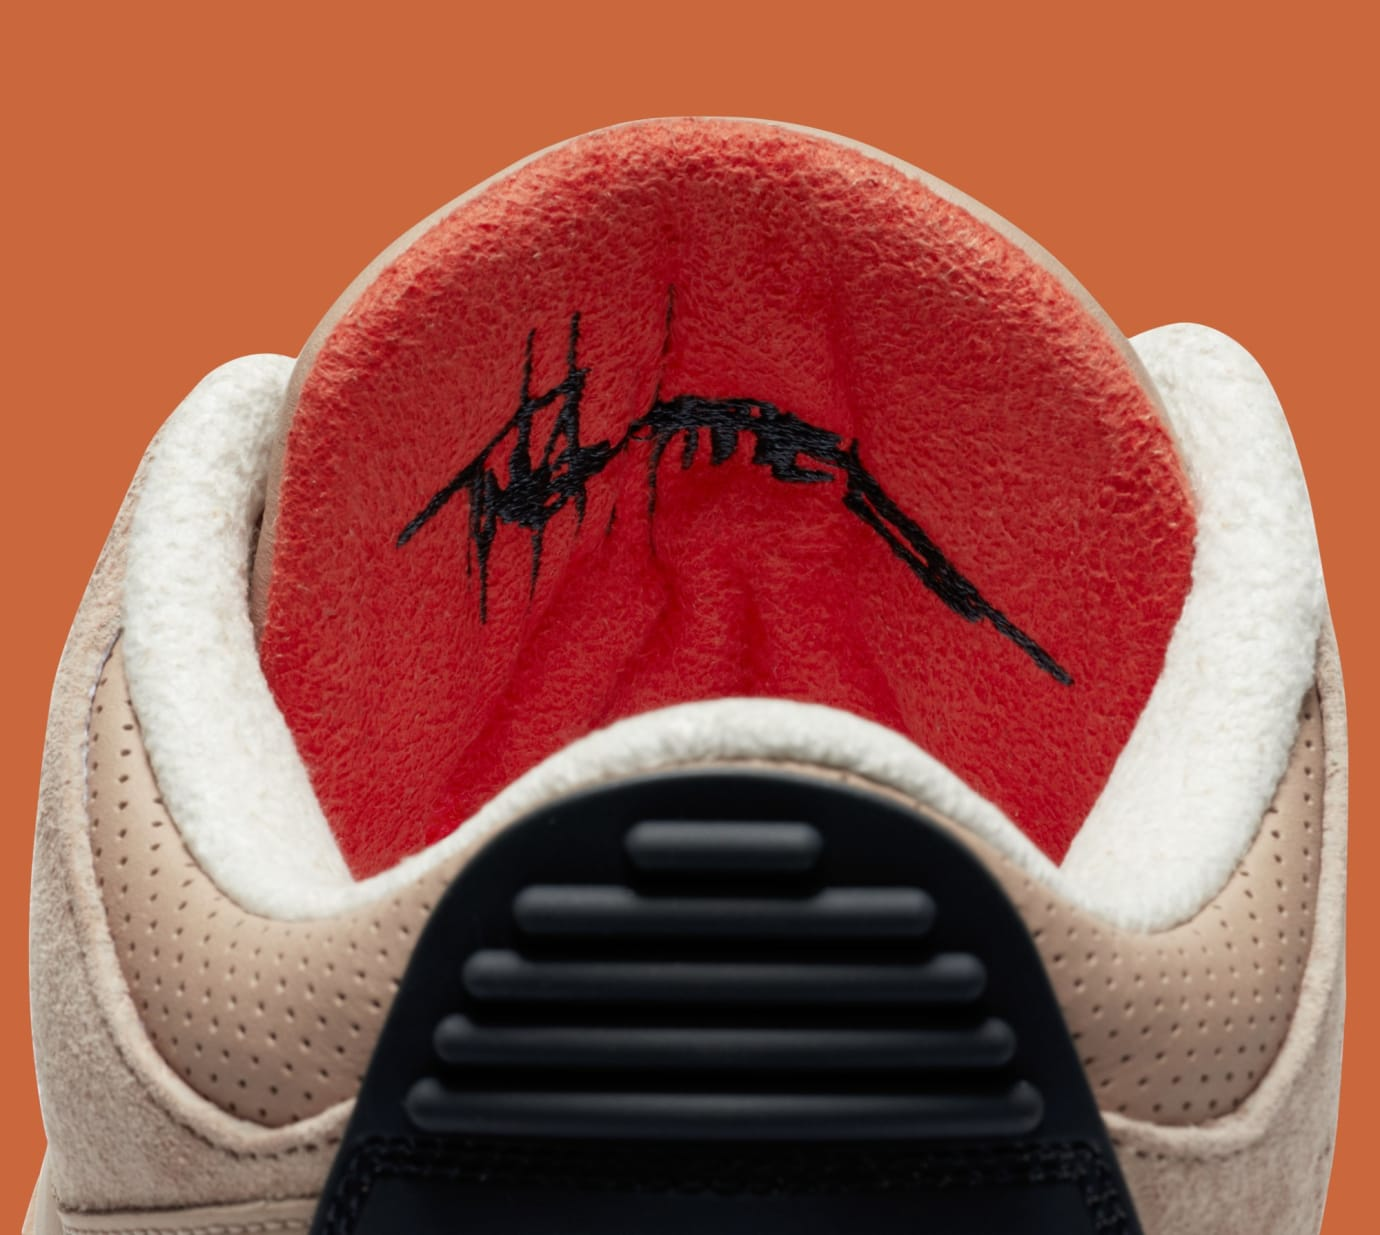 a79495722f2 Image via Nike Justin Timberlake x Air Jordan 3 JTH NRG 'Bio Beige'  AV6683-200 (